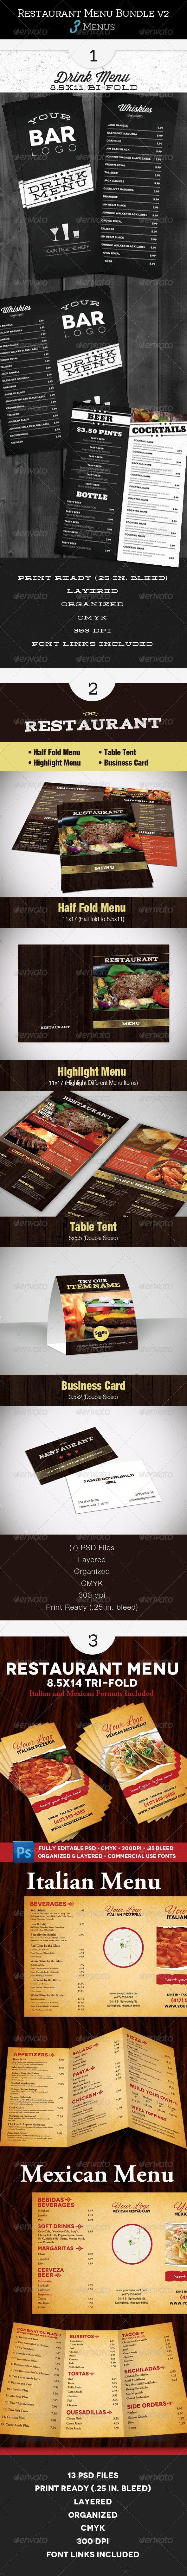 Restaurant Menu Bundle 2 51 best Flyer